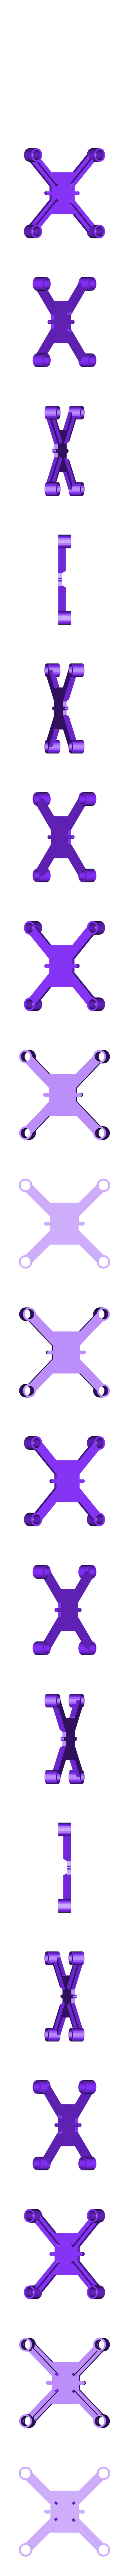 dronedrame_7mm_motors_lite.stl Download free STL file Drone Frame for all motor sizes ! - 6mm,6.5mm,7mm,7.5mm,8mm,8.5mm • 3D printable model, Gophy